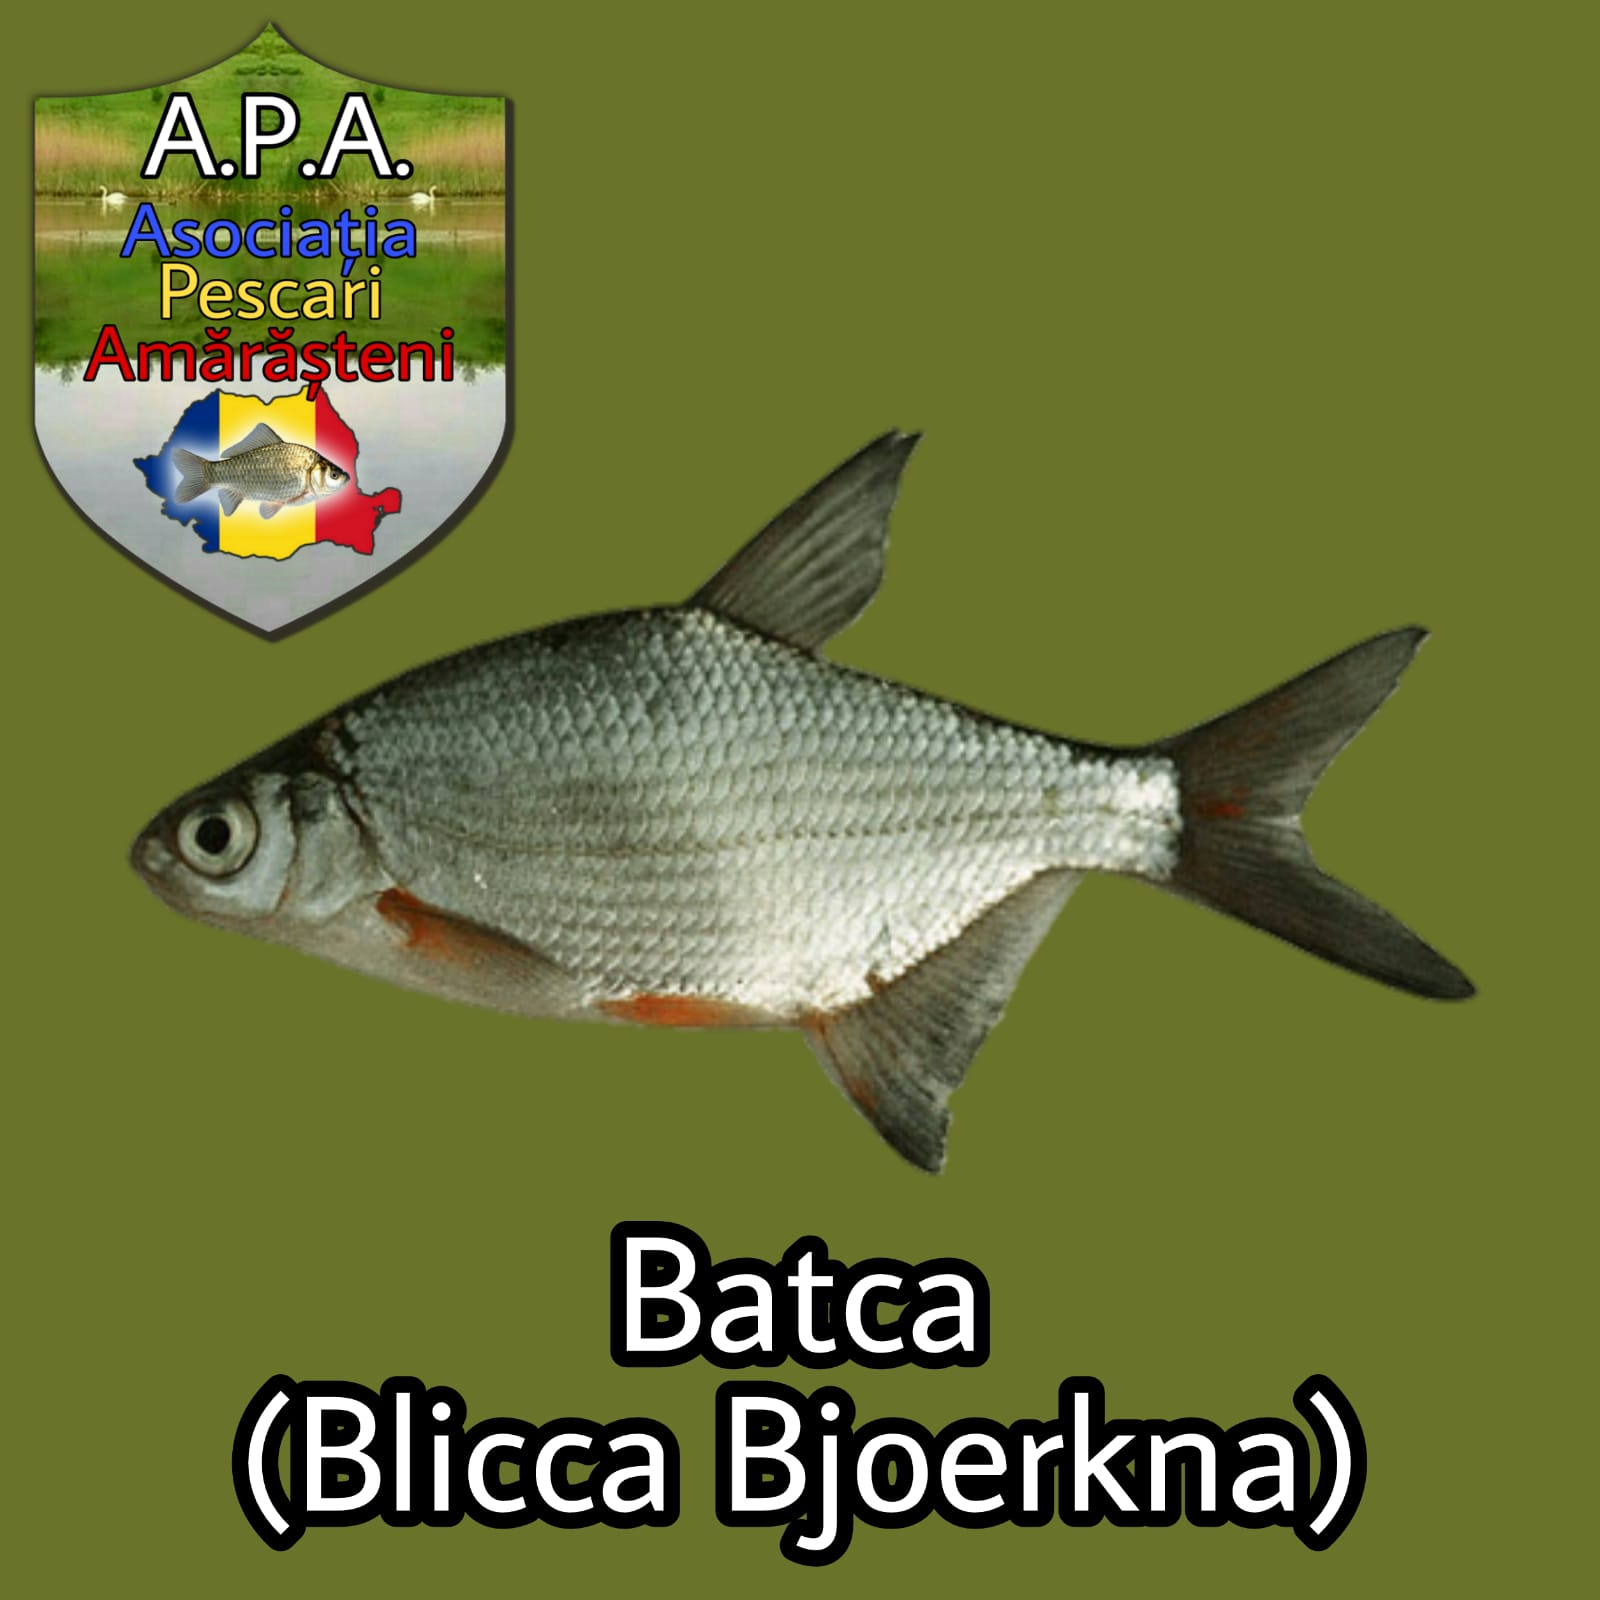 Batca (Blicca bjoerkna)